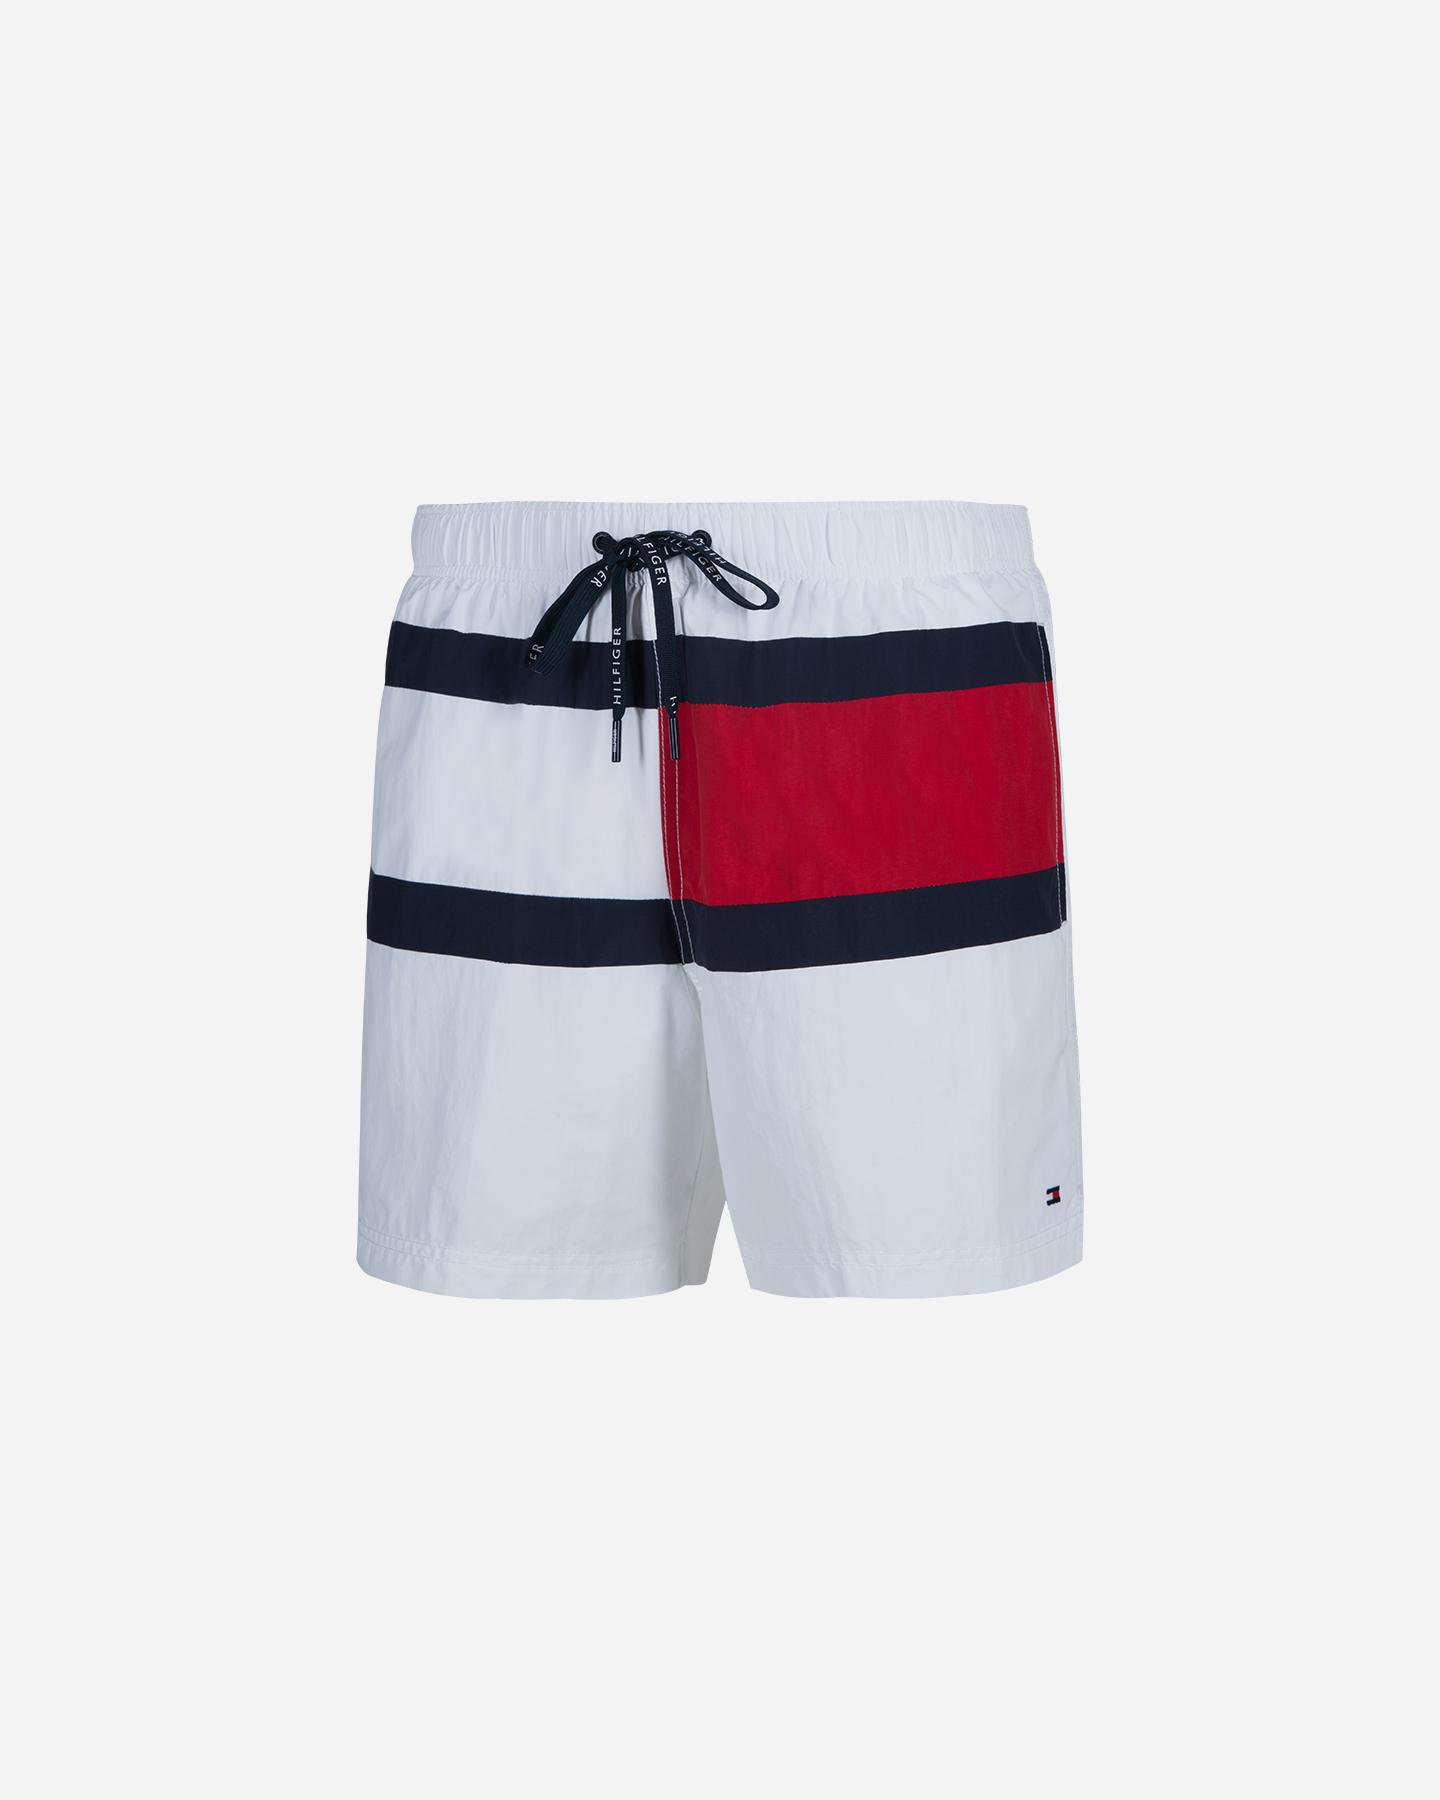 8f47c11a5dc5 Boxer Mare Tommy Hilfiger Color Block Tommy M UM0UM00497-611 ...